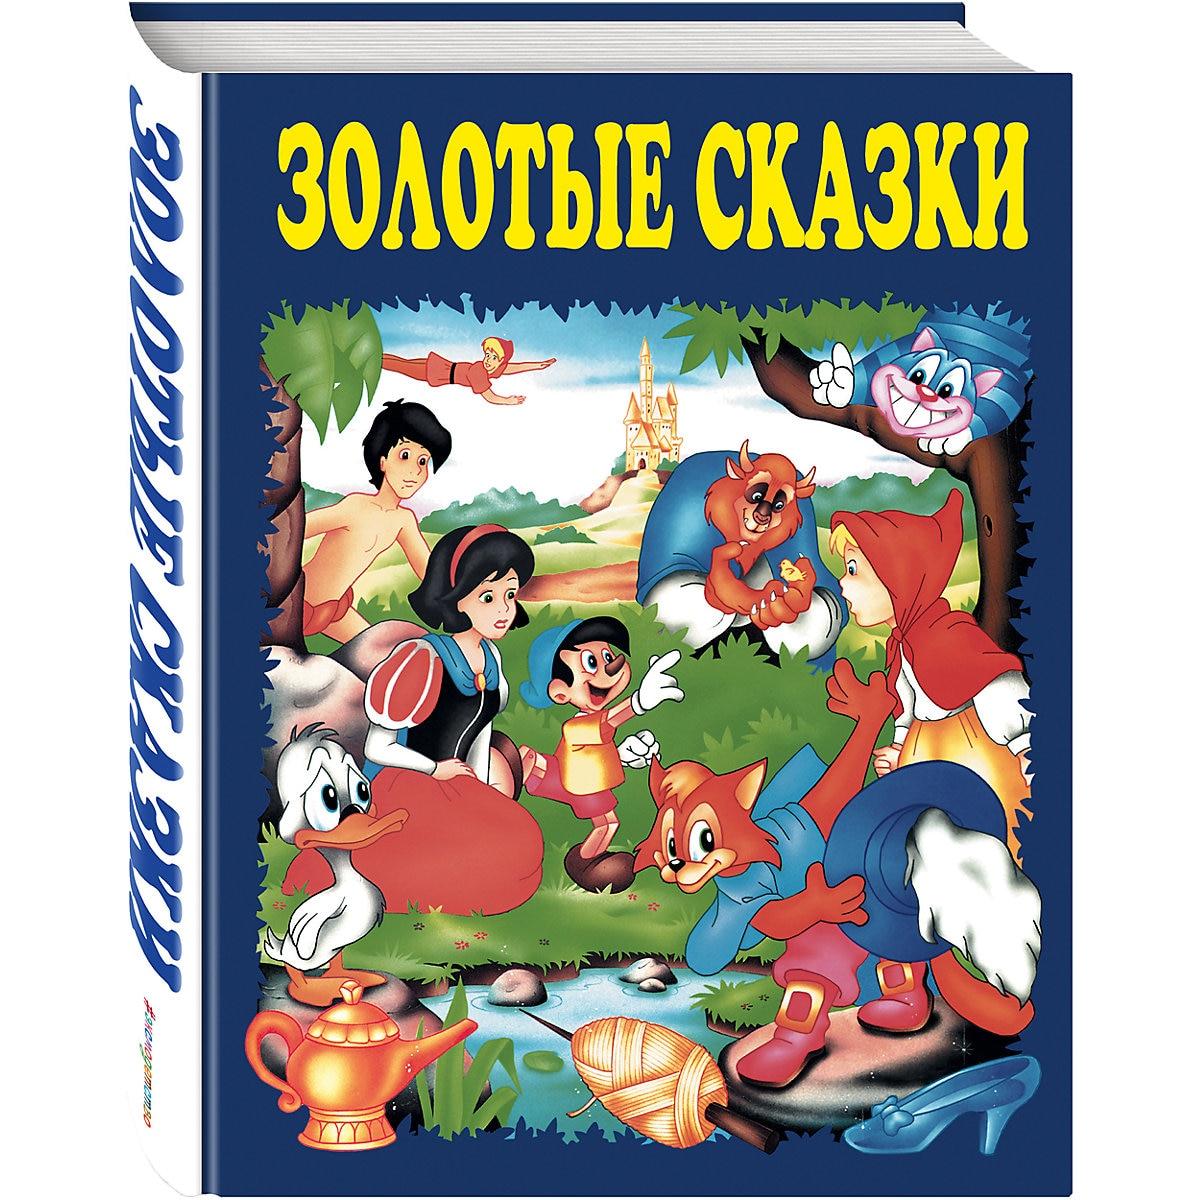 Books EKSMO 5535401 Children Education Encyclopedia Alphabet Dictionary Book For Baby MTpromo